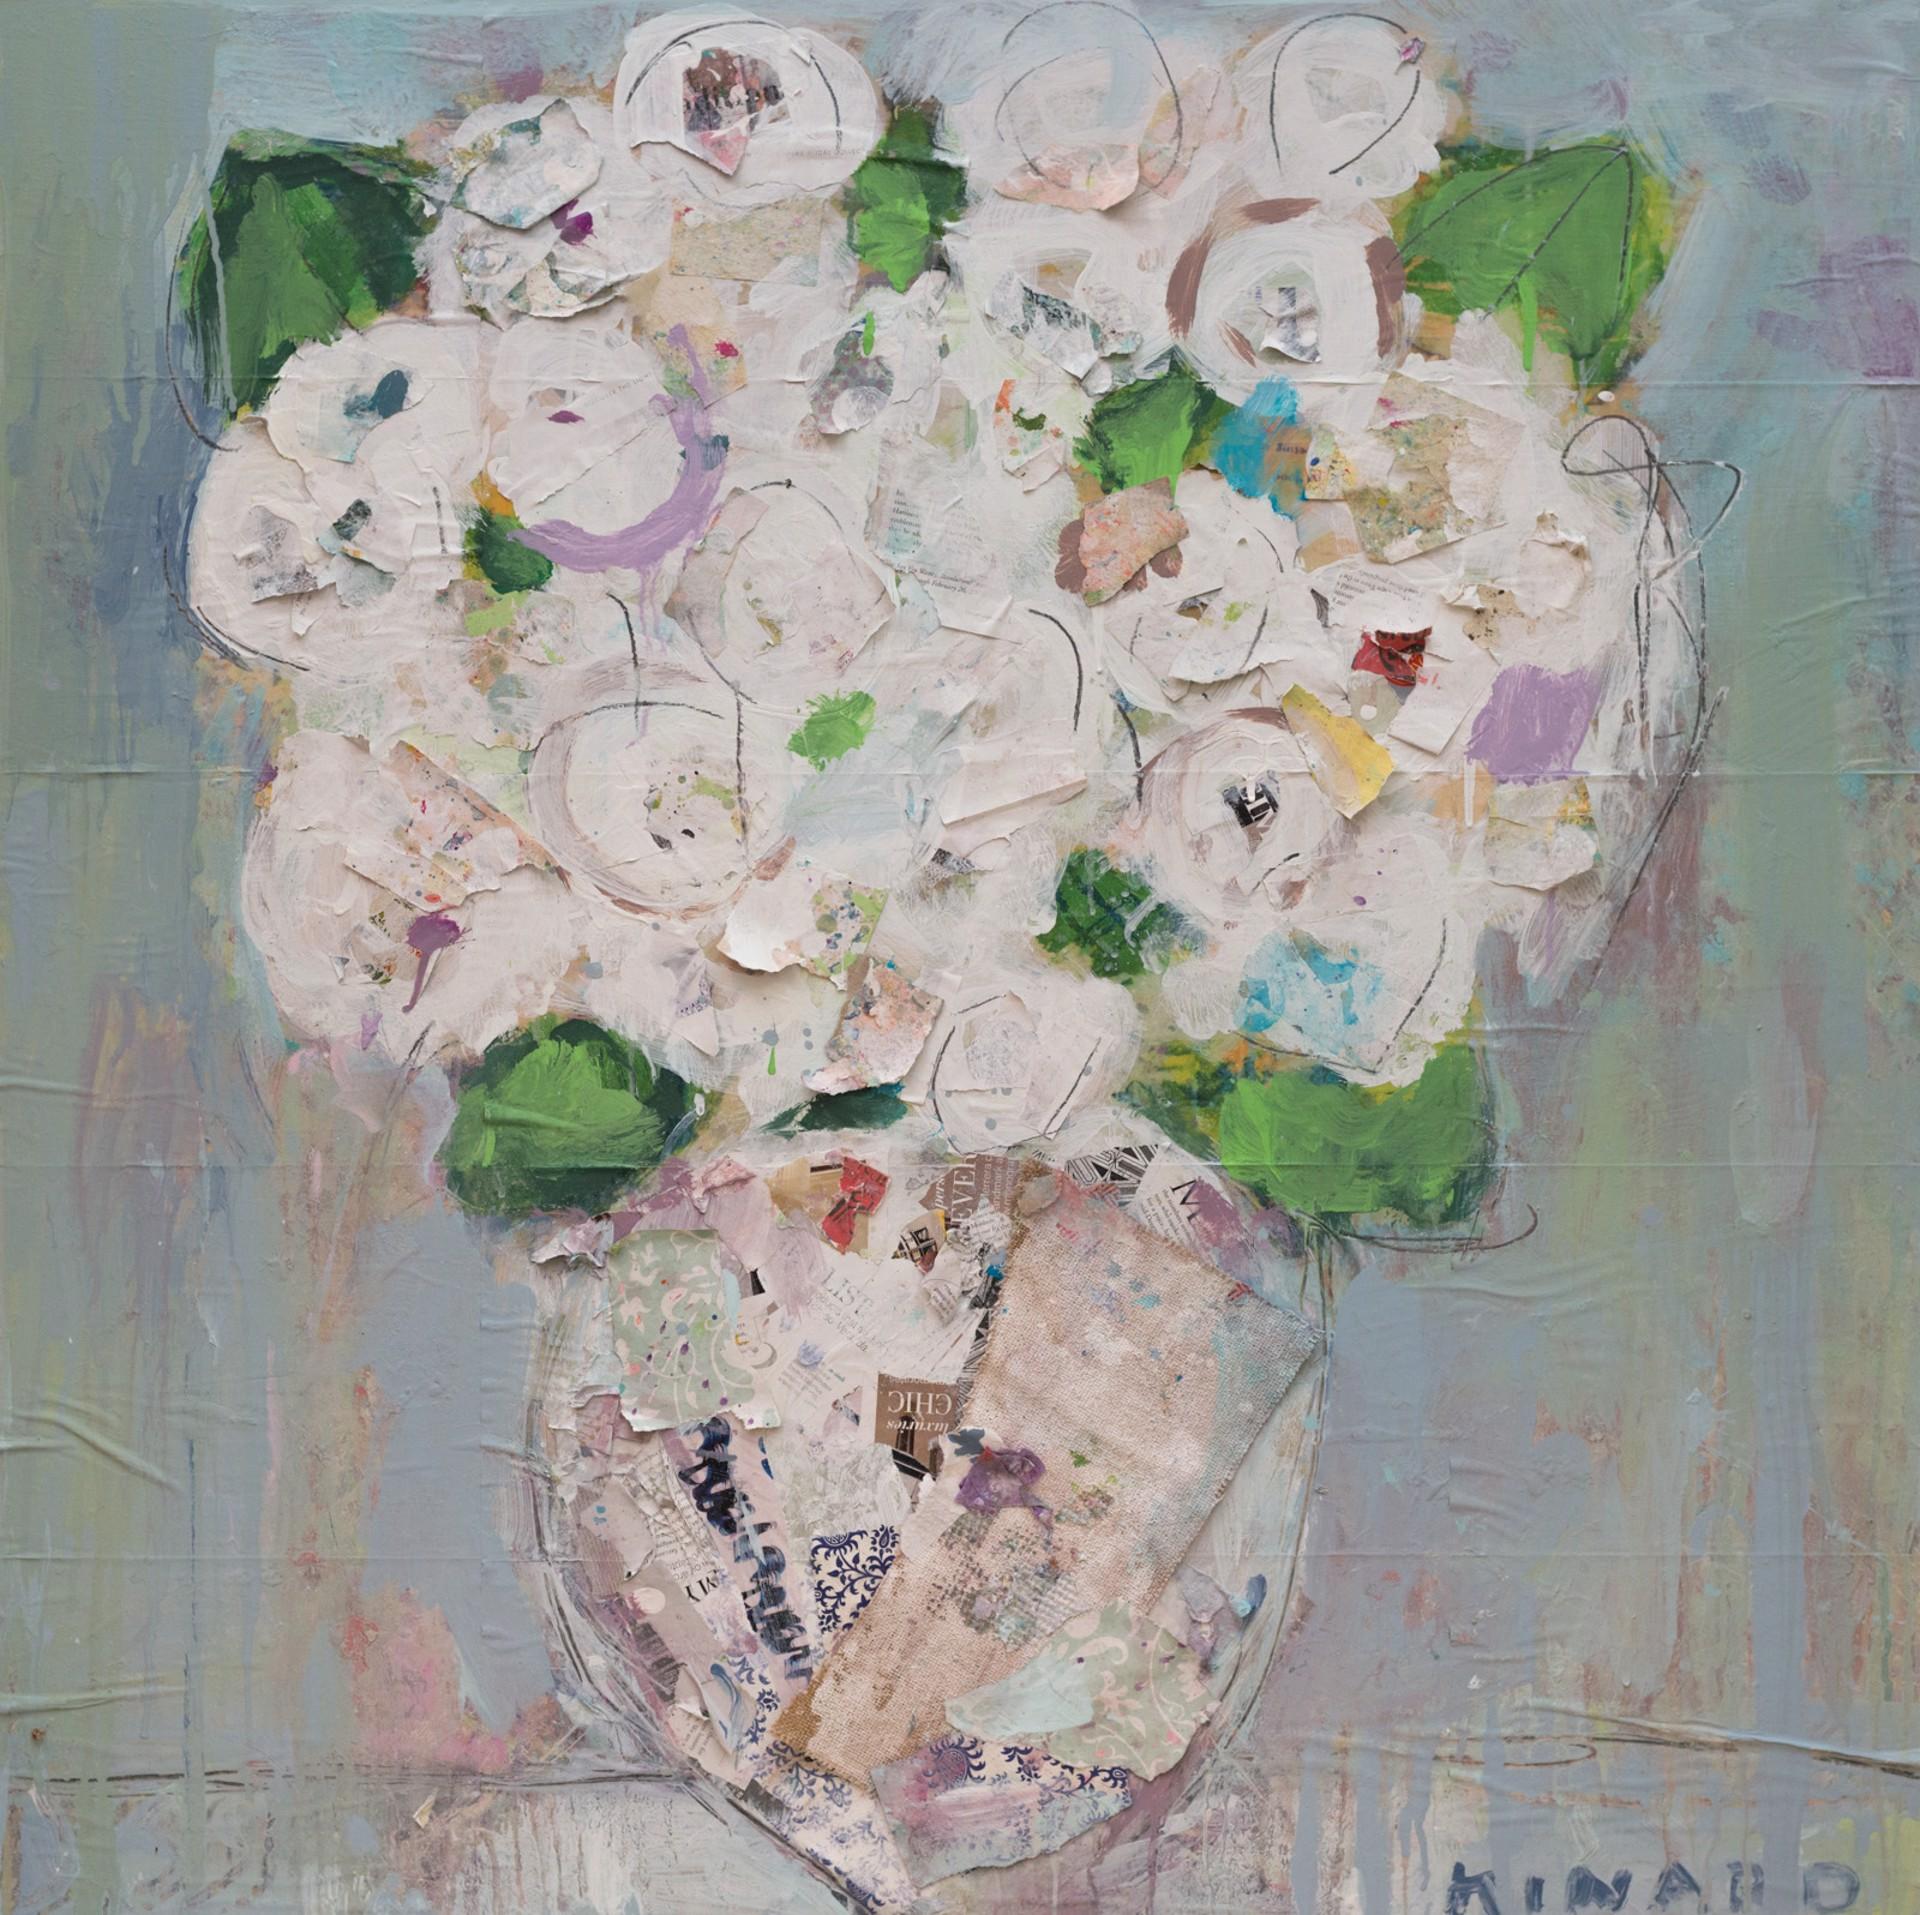 Hydrangea Love by Christy Kinard